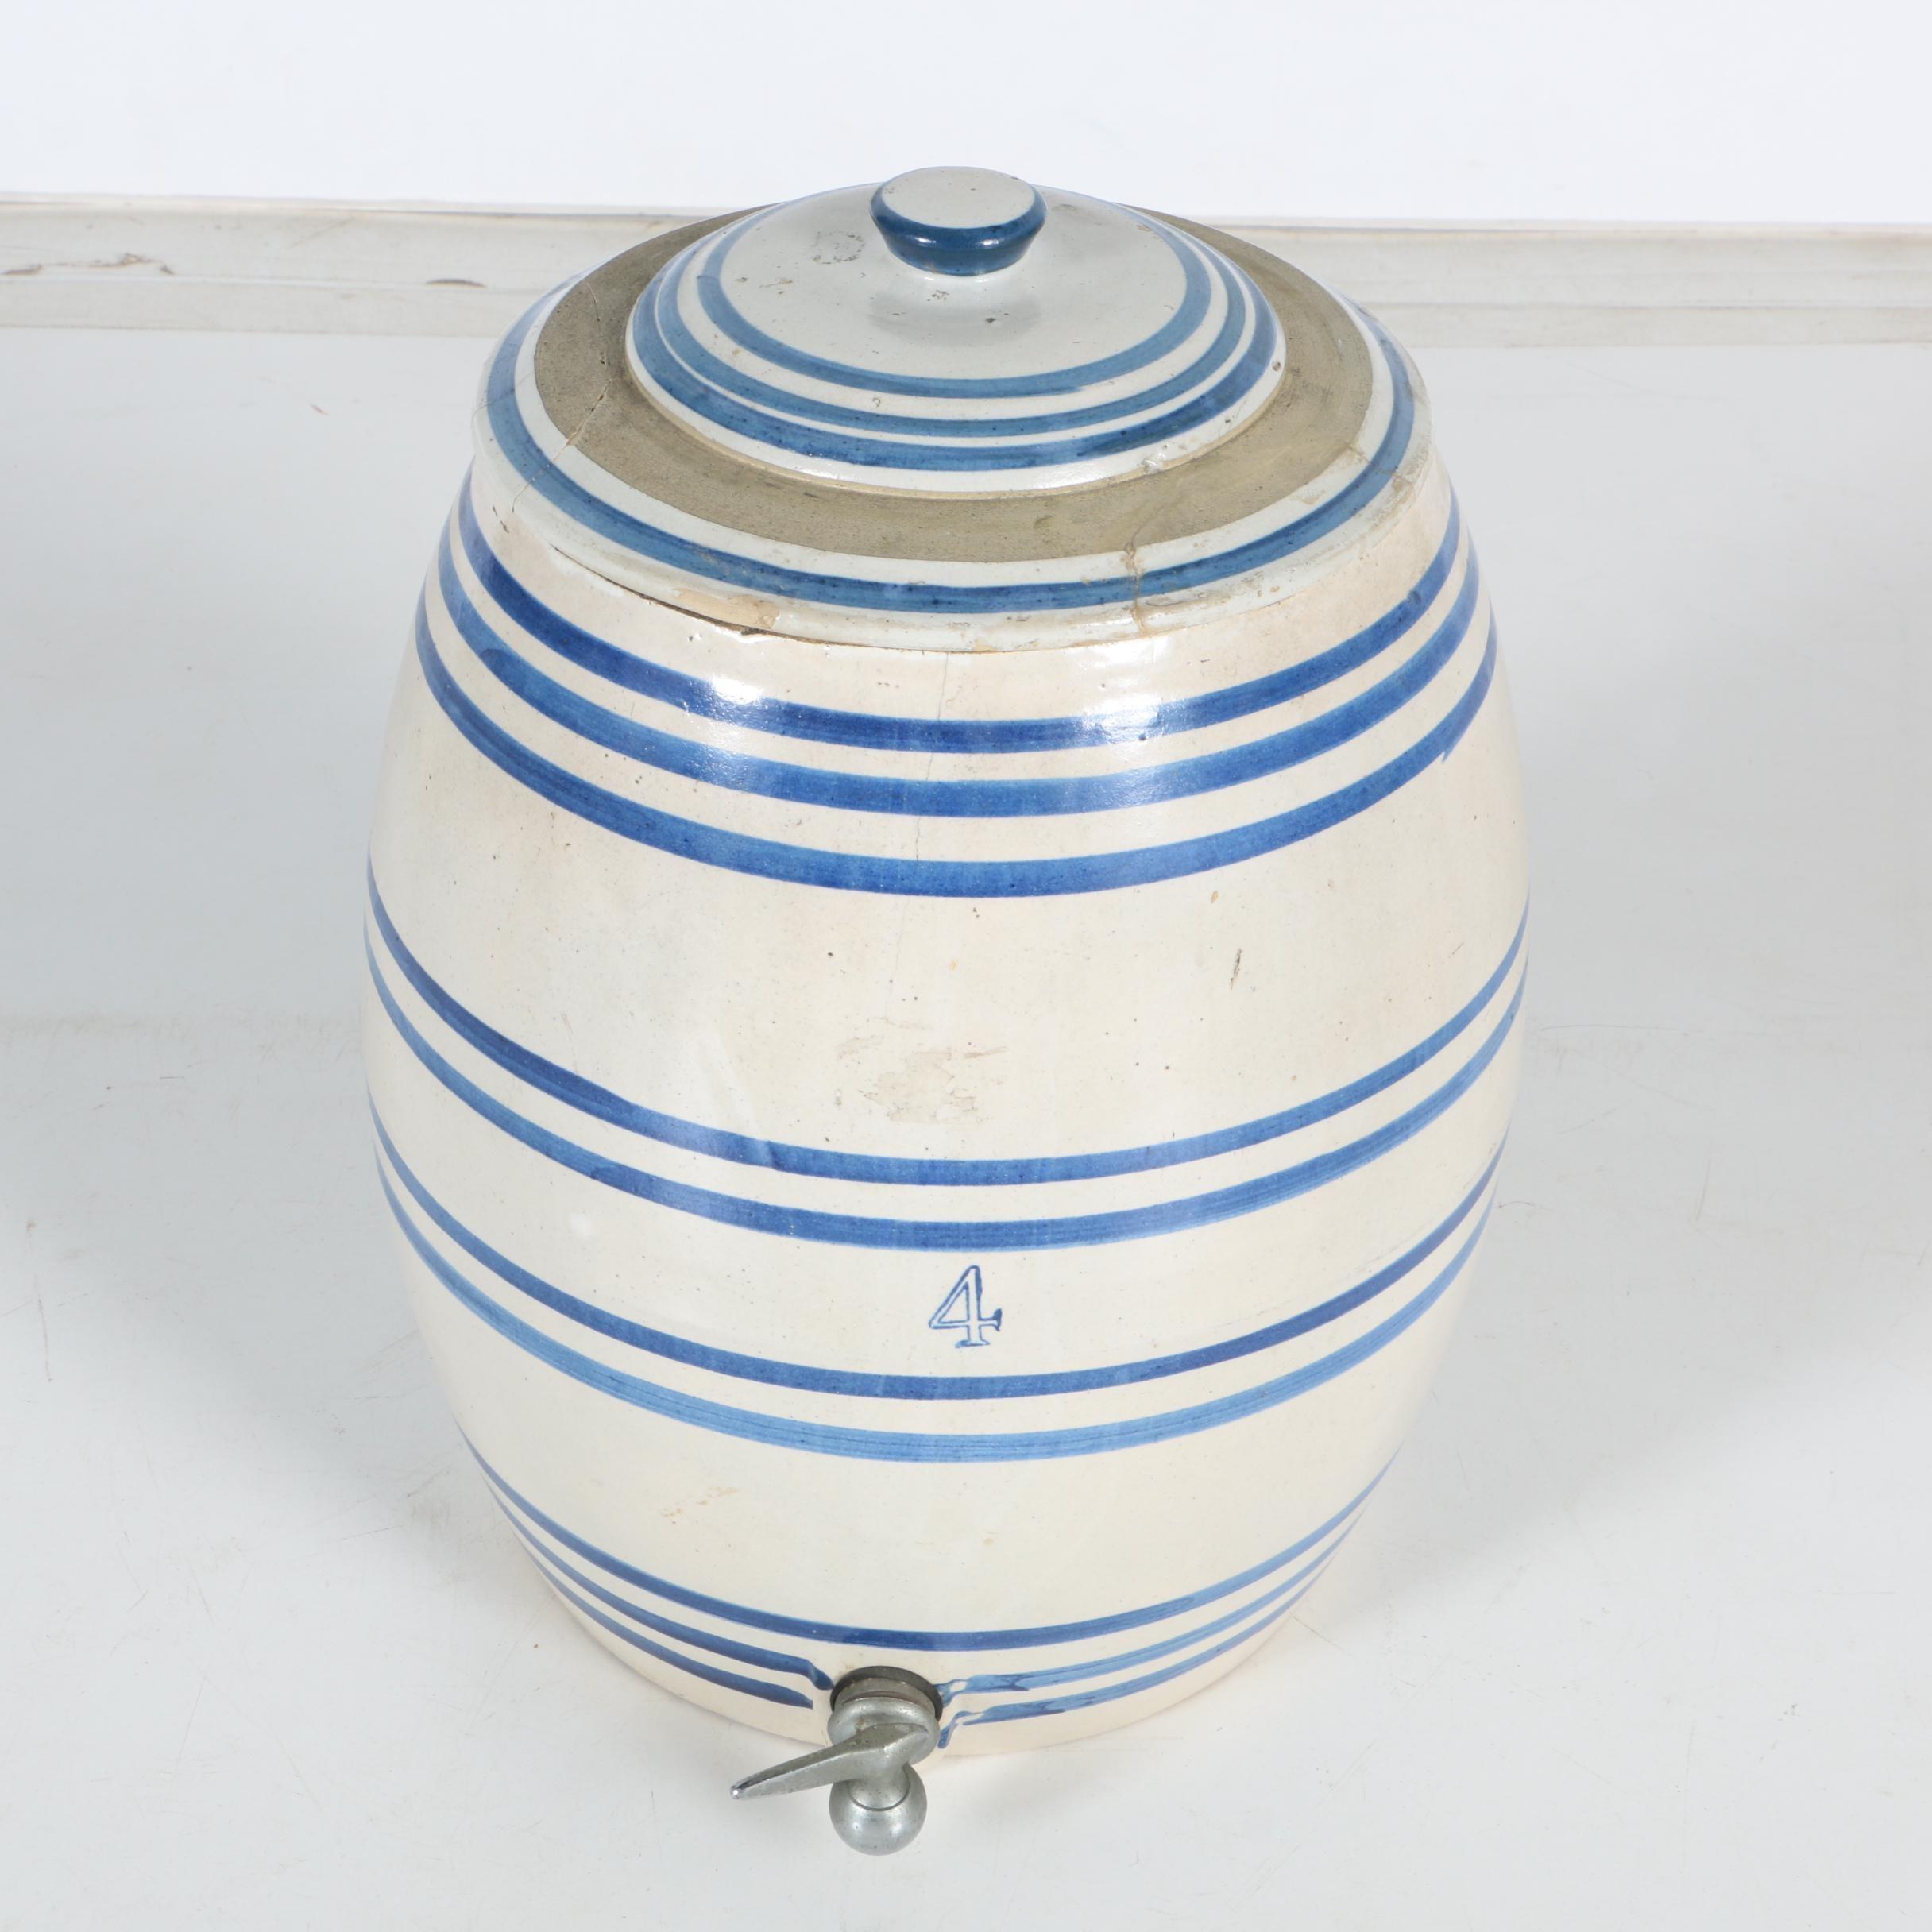 Vintage Blue Striped Stoneware Cooler with Spigot